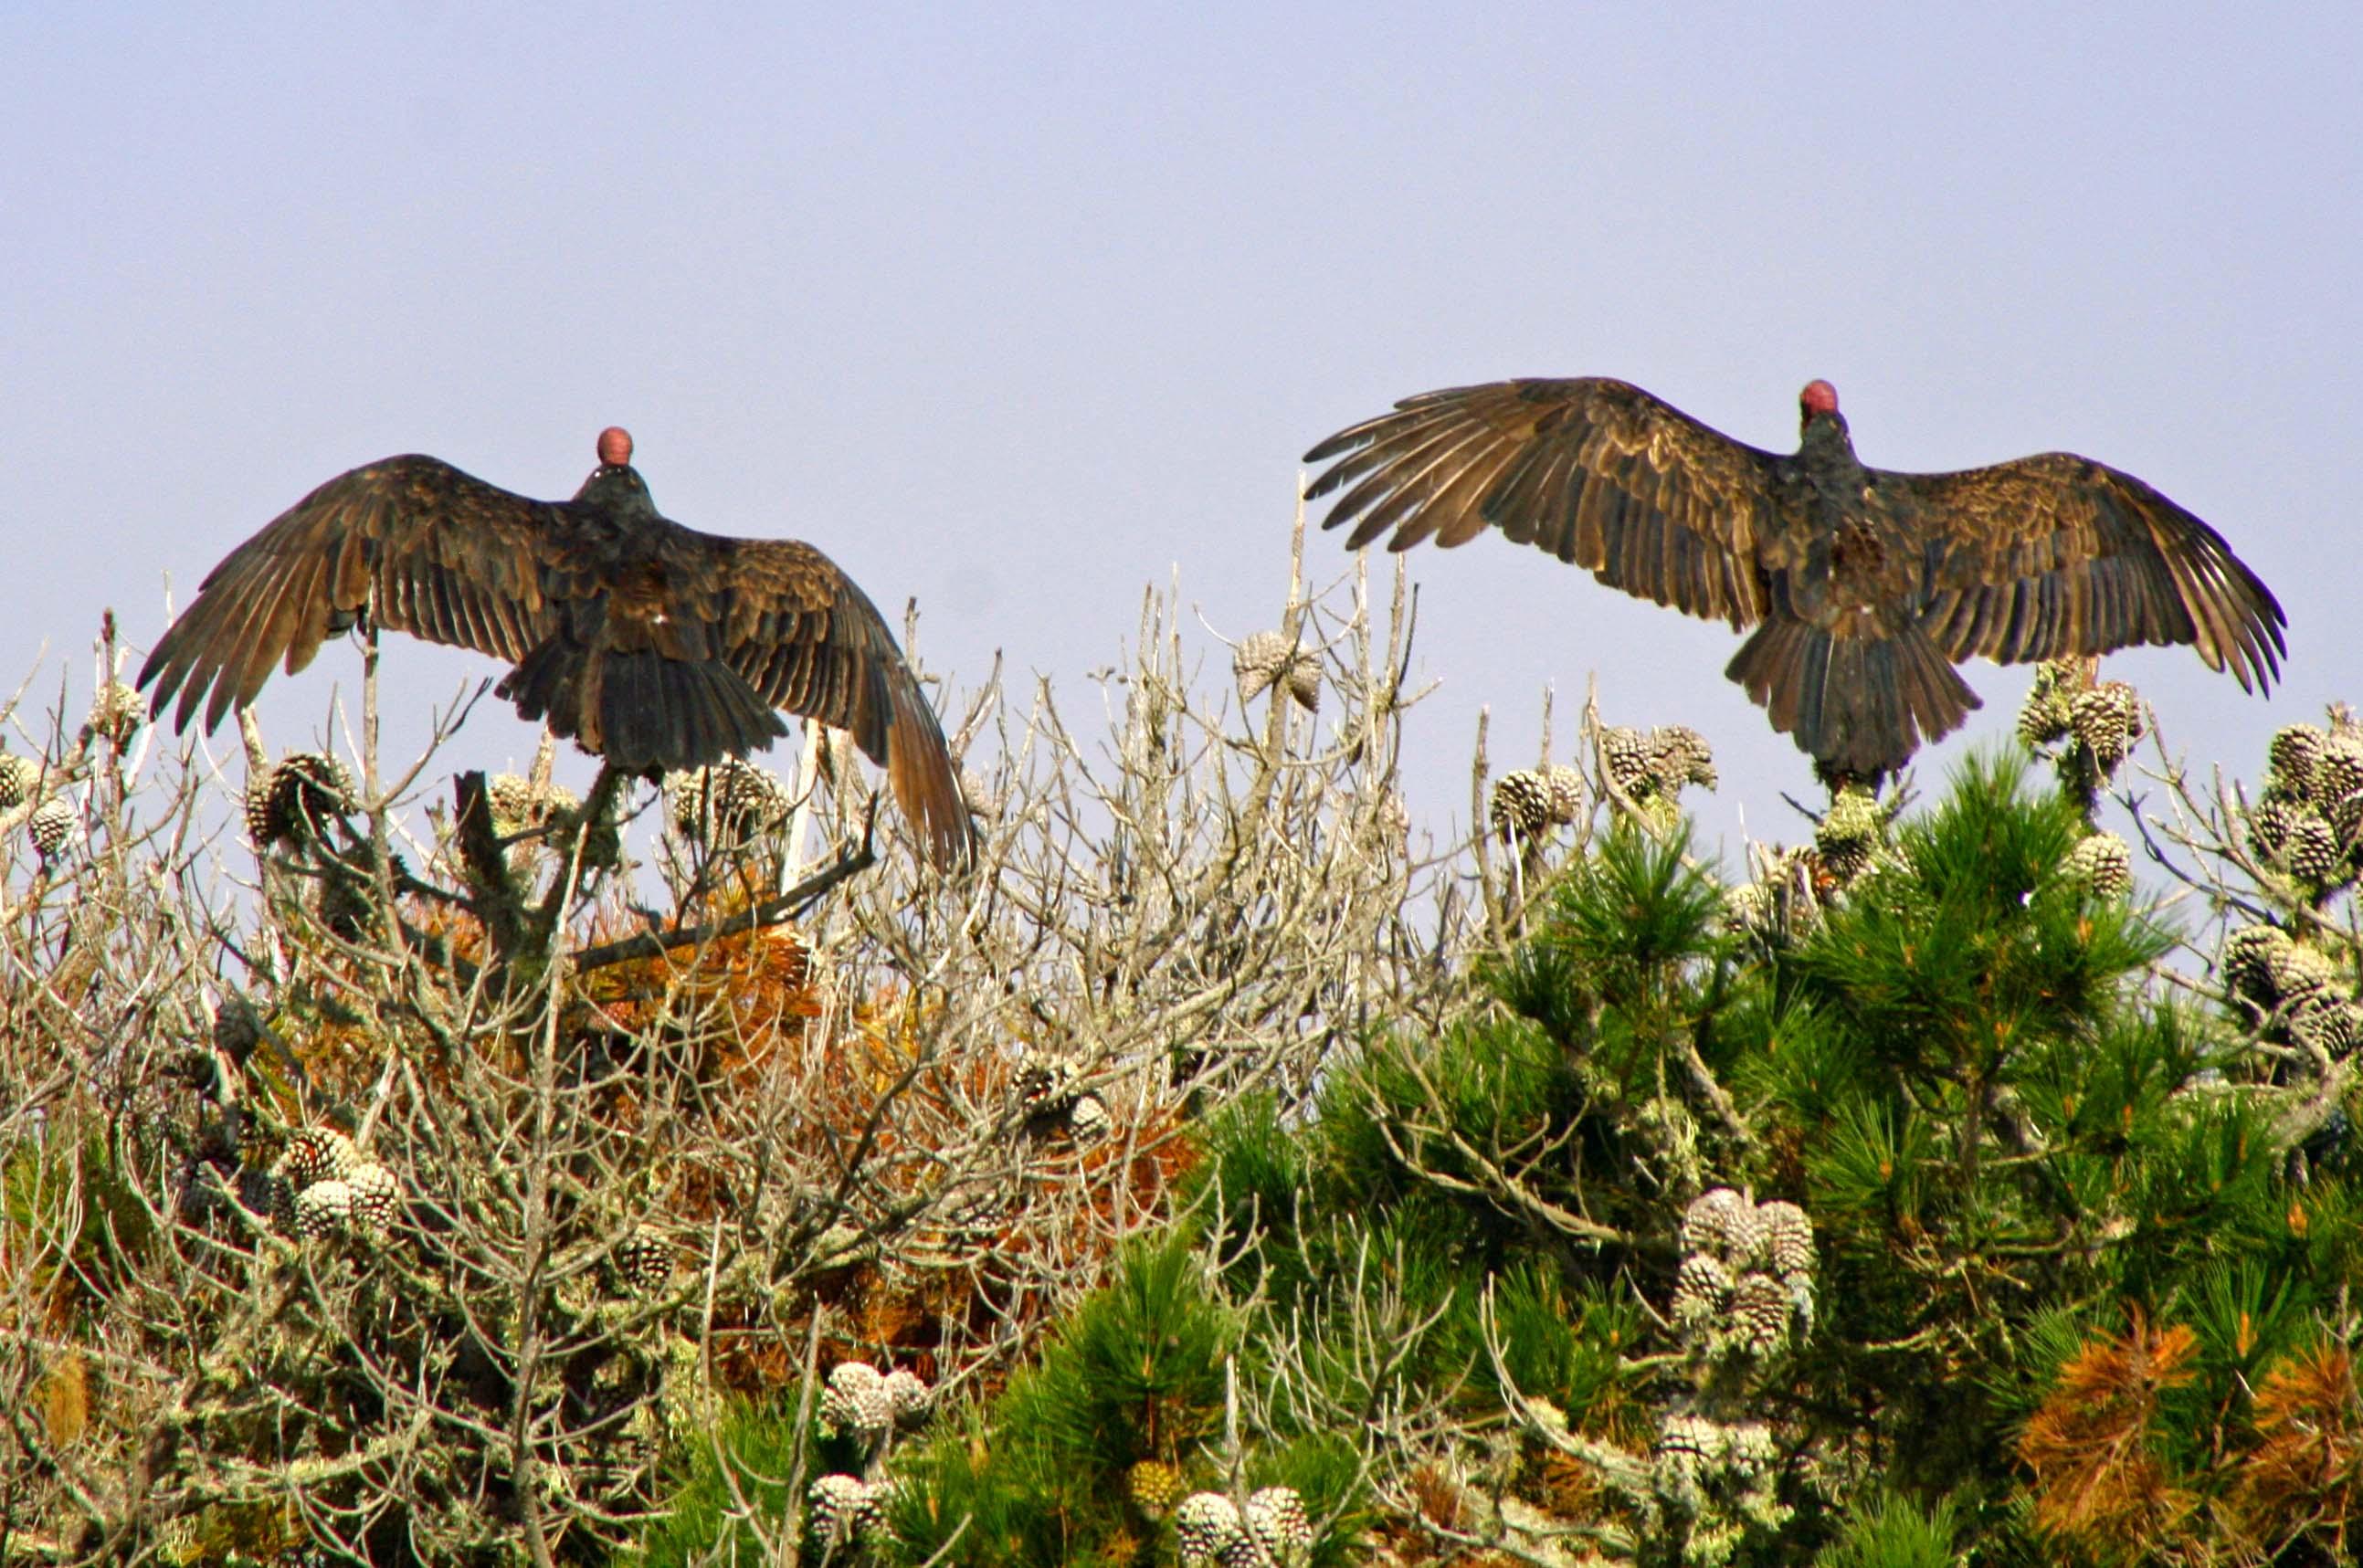 Buzzards dry wings at Pt. Reyes National Seashore.